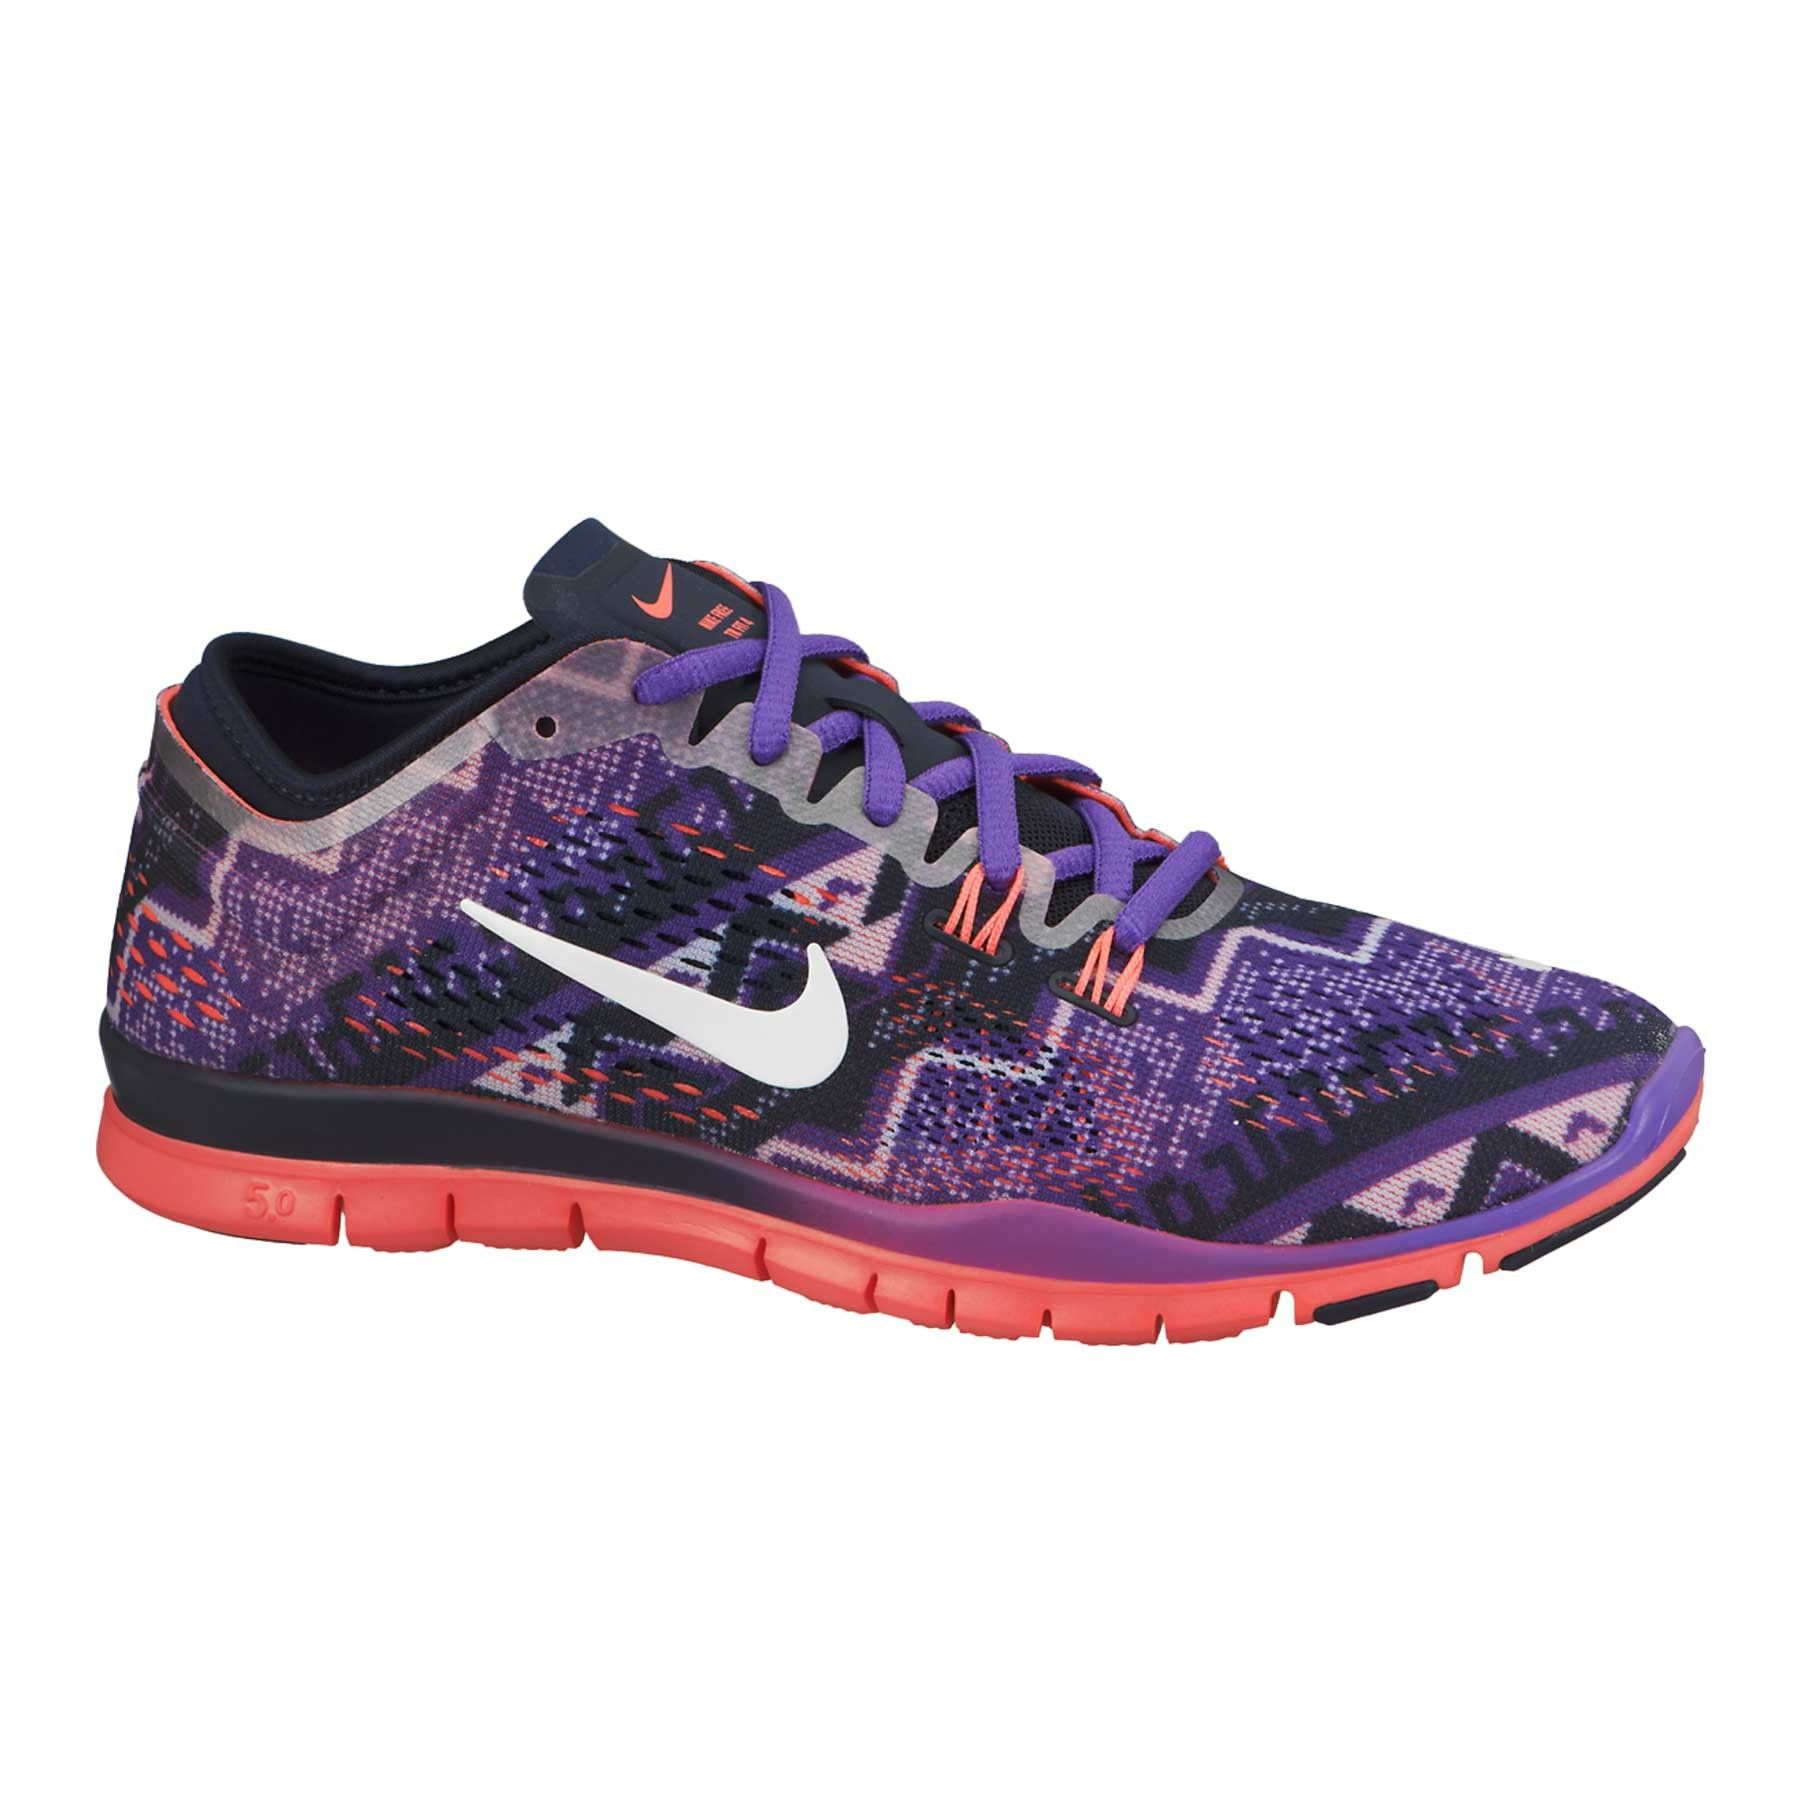 993f30a9ba00 Nike Free TR Fit 4 Nordic Print Women s Training Shoe in blue or purple ...